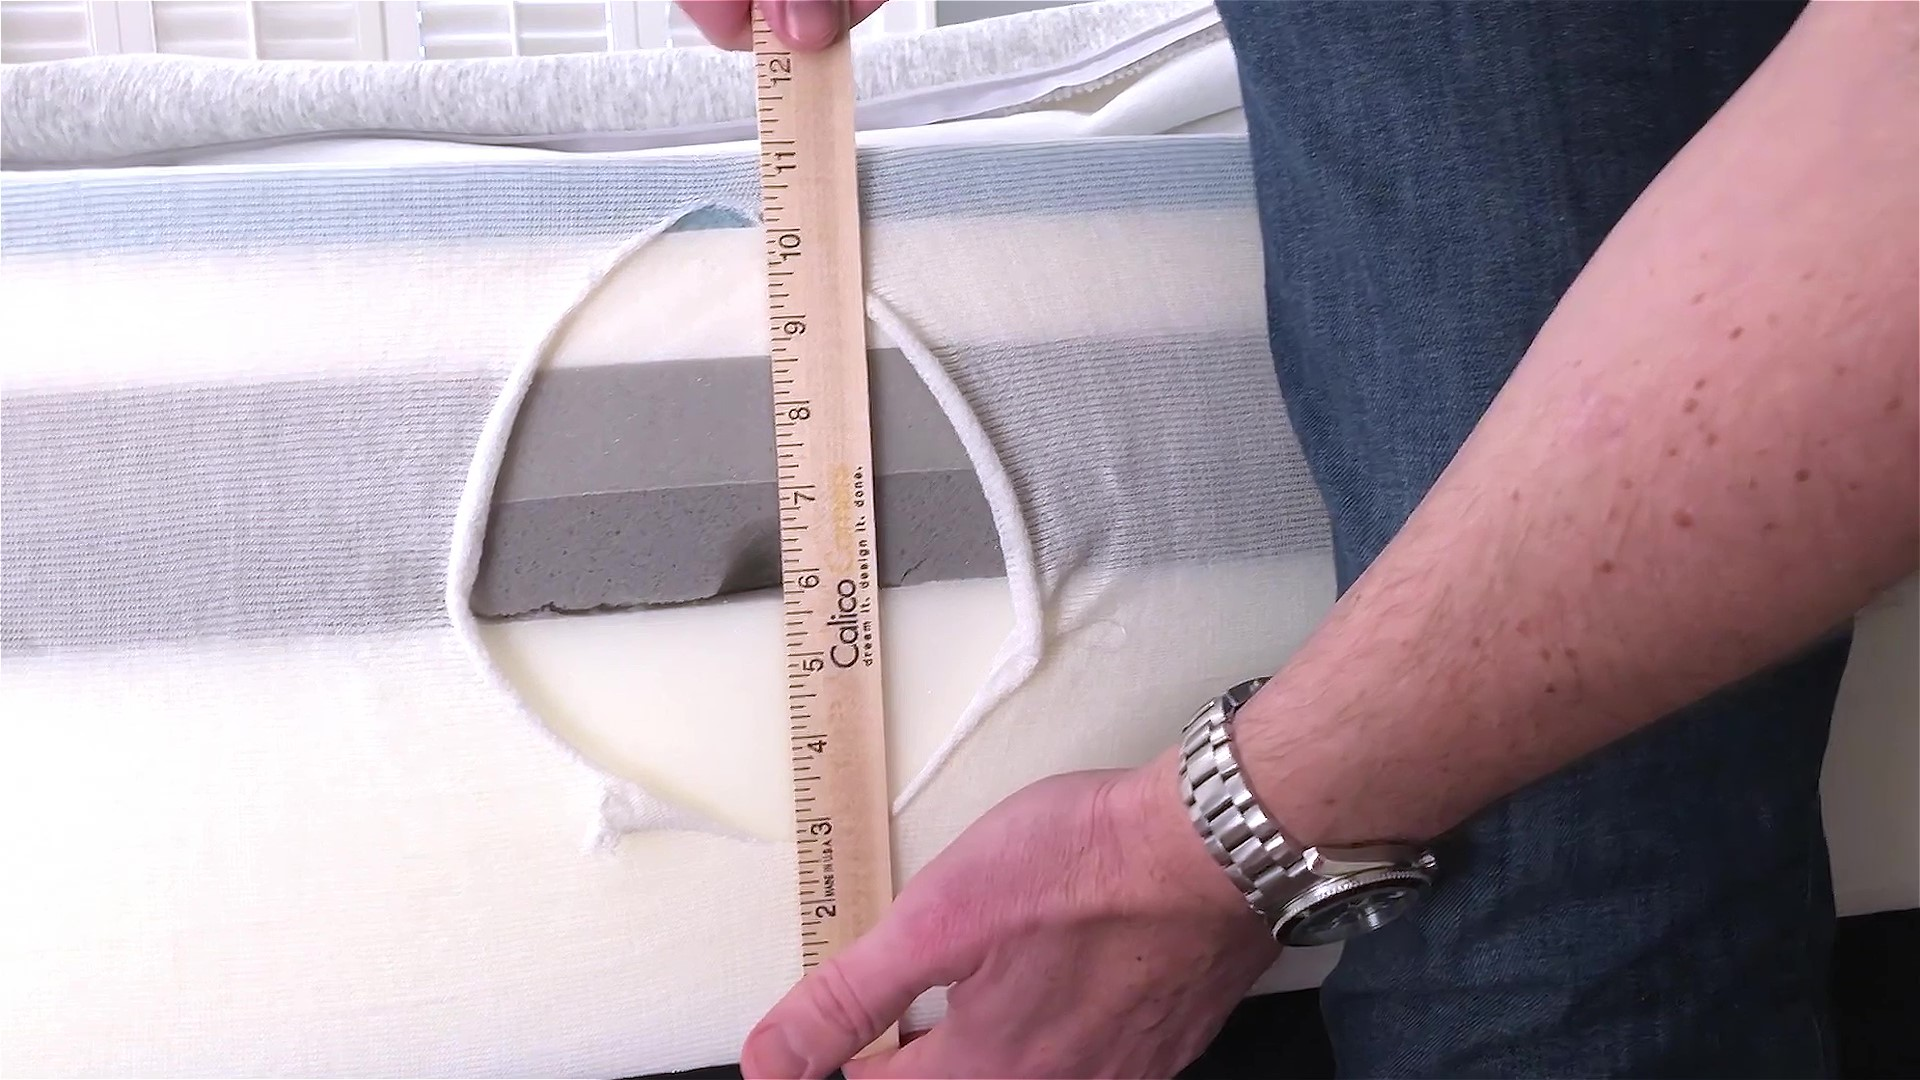 Casper Wave Mattress Layers